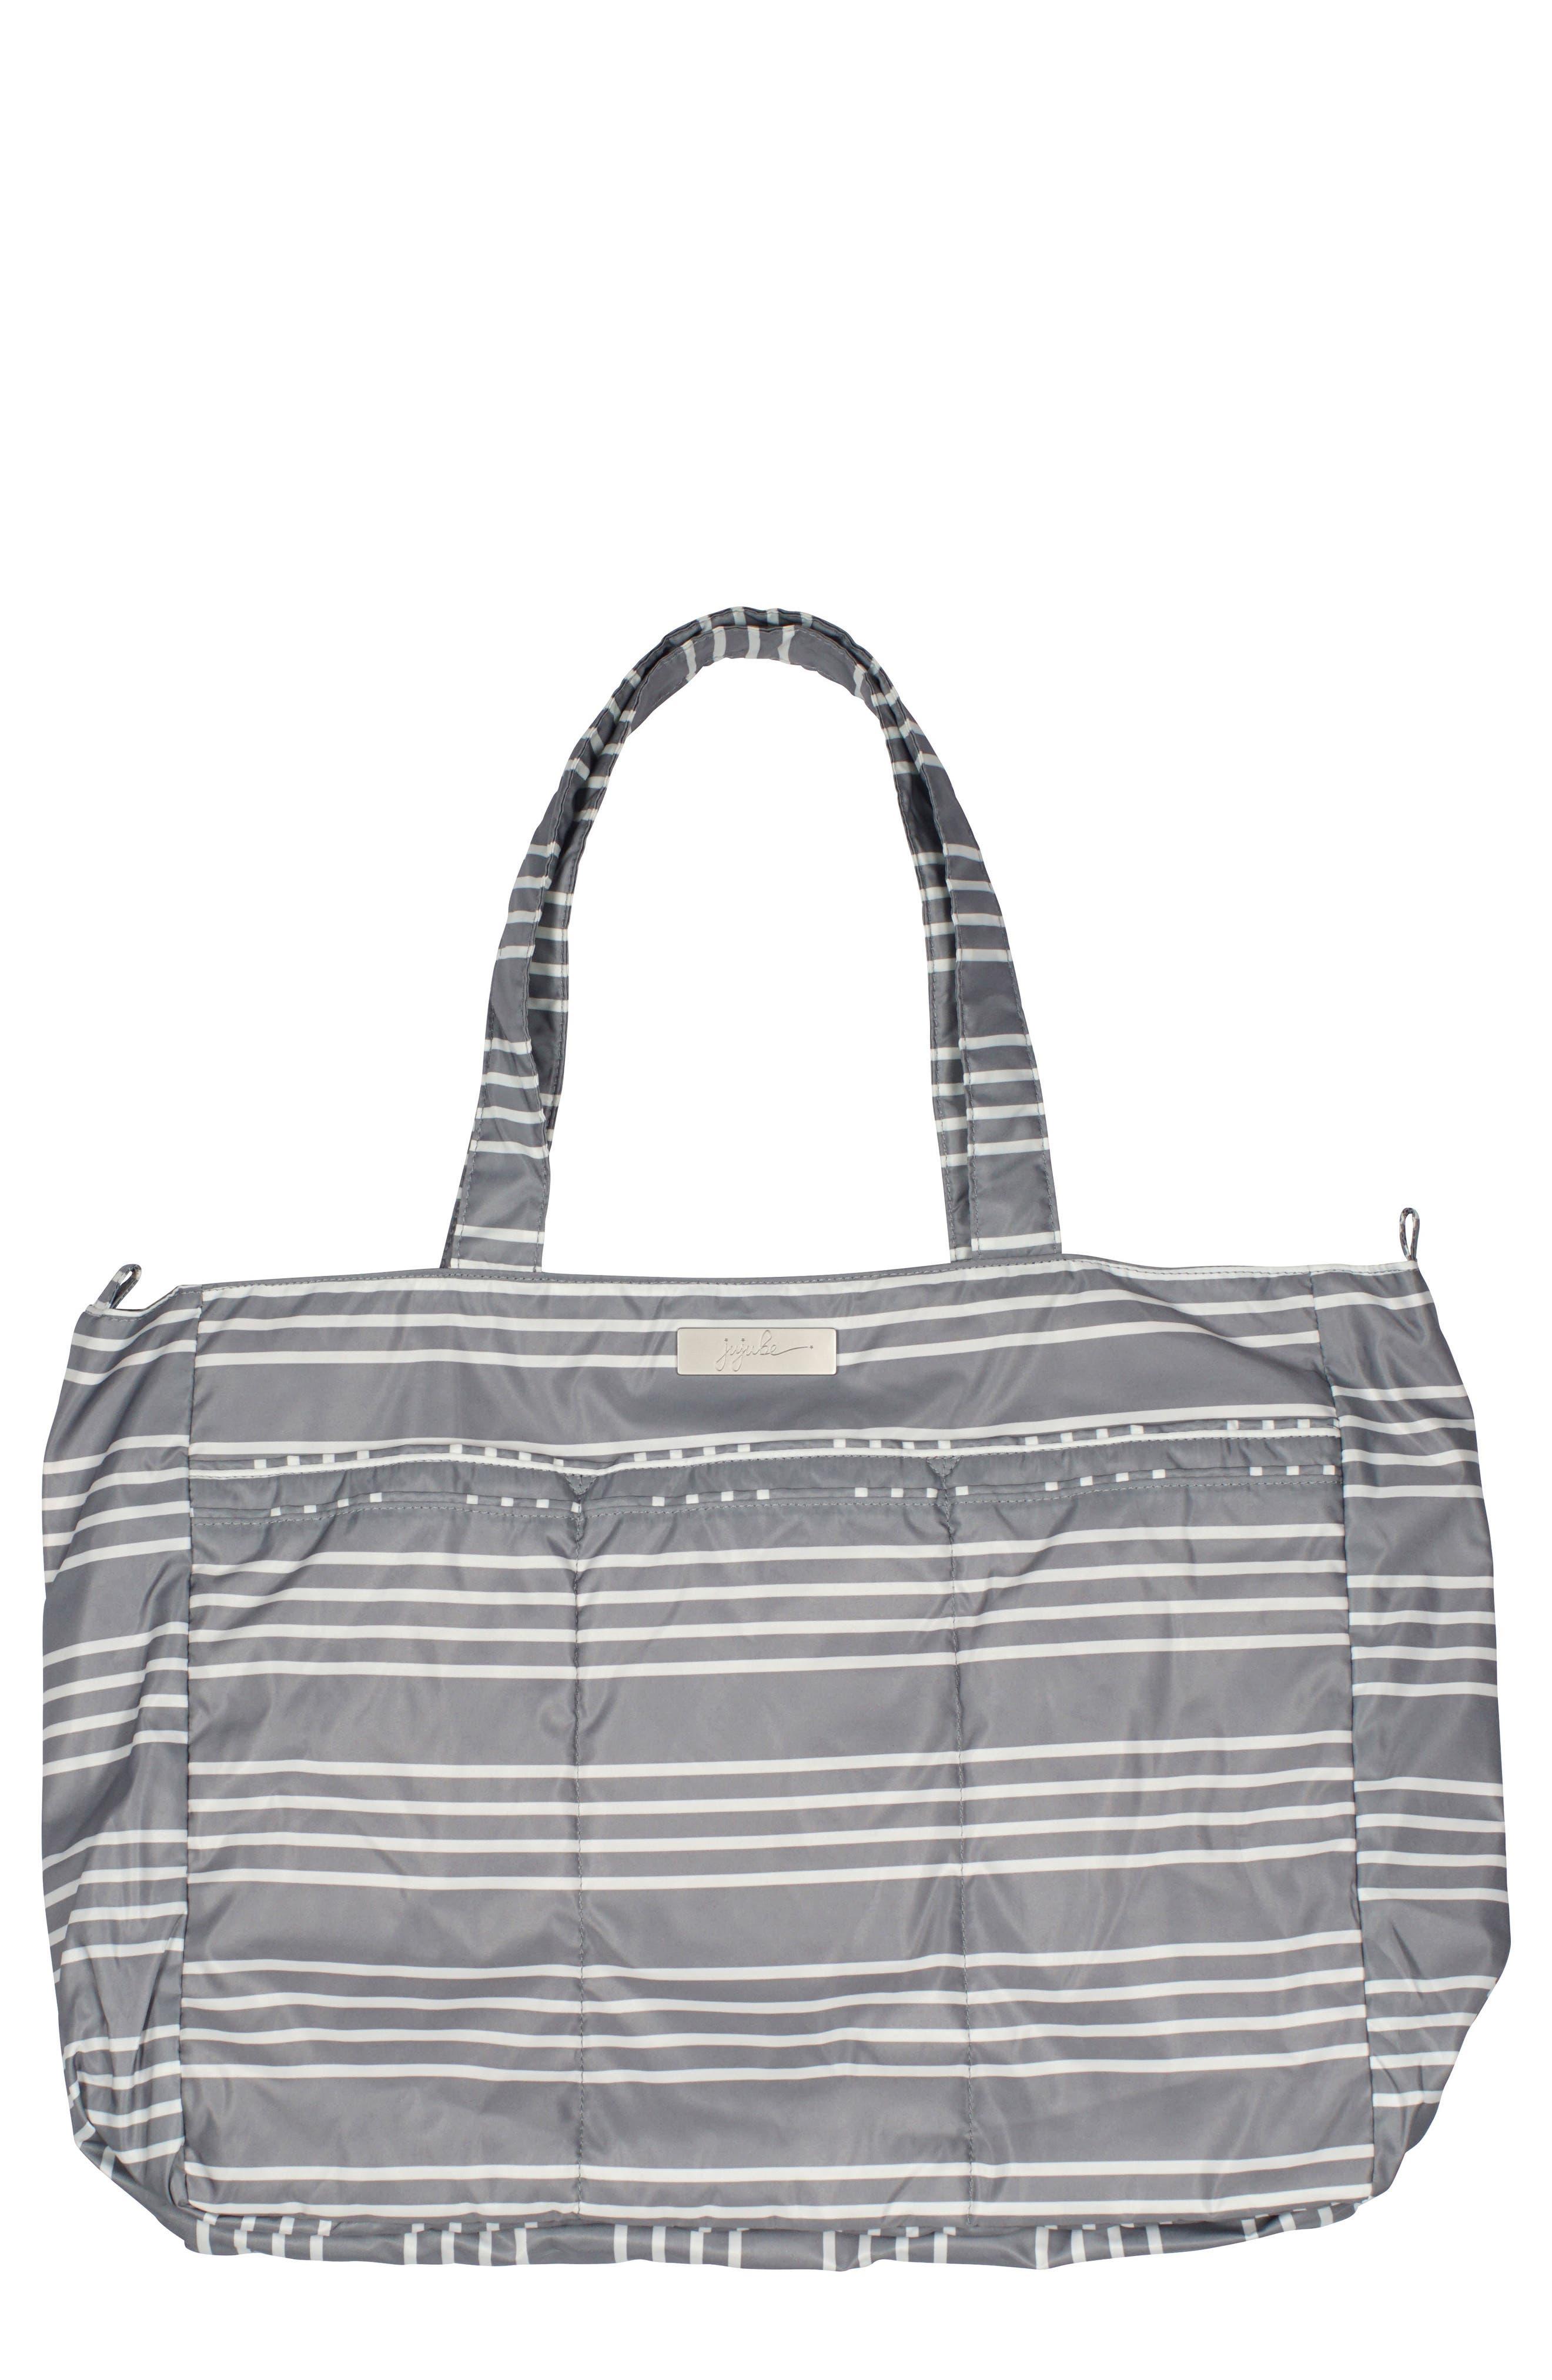 Alternate Image 1 Selected - Ju-Ju-Be Super Be - Coastal Collection Diaper Bag